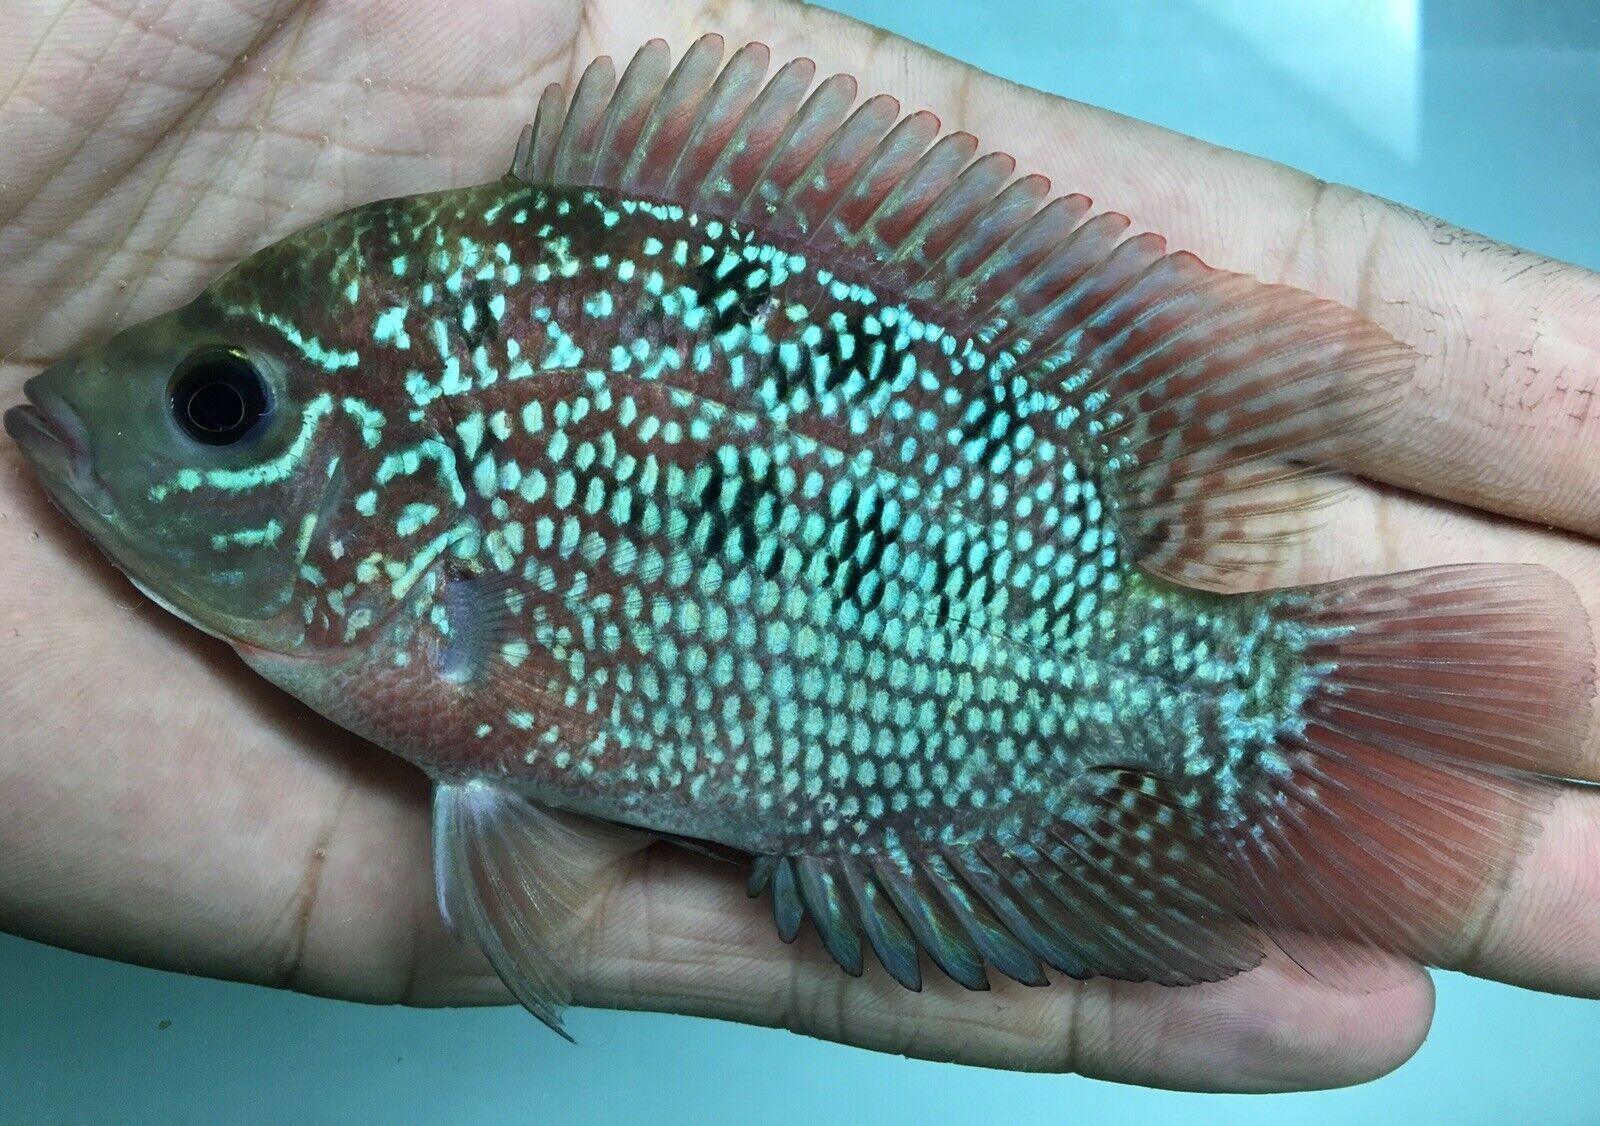 Flowerhorn Female Kamfa High Aquarium fish, Cichlids, Fish